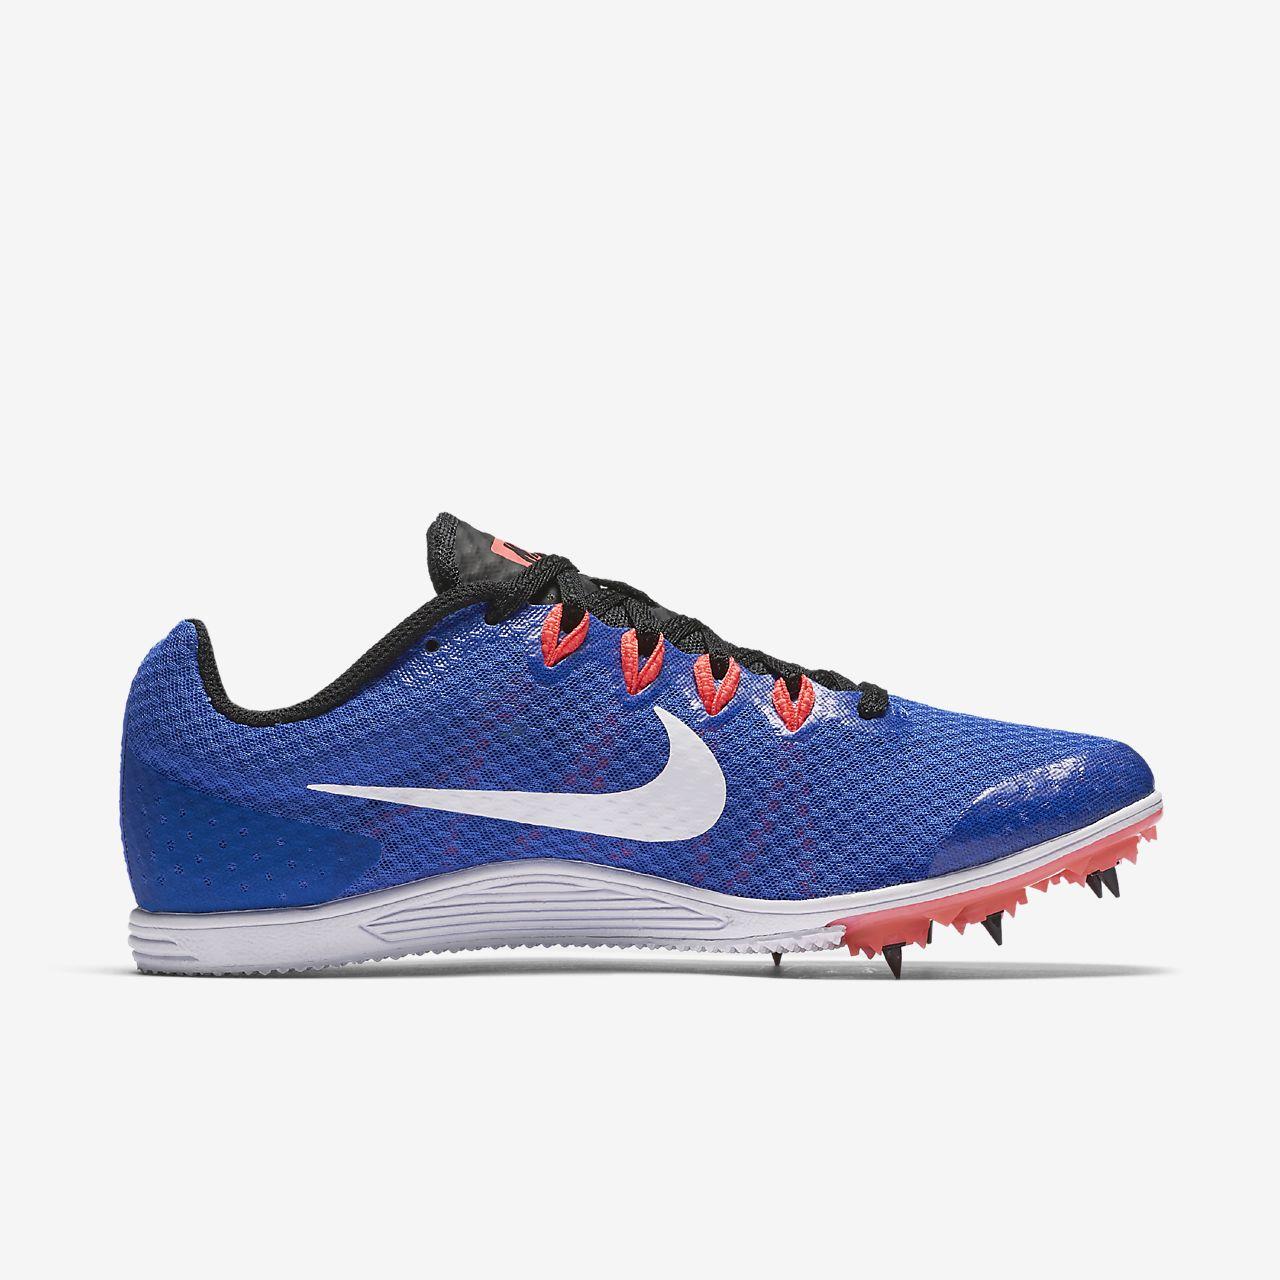 ... Nike Zoom Rival D 9 Women\u0027s Track Spike